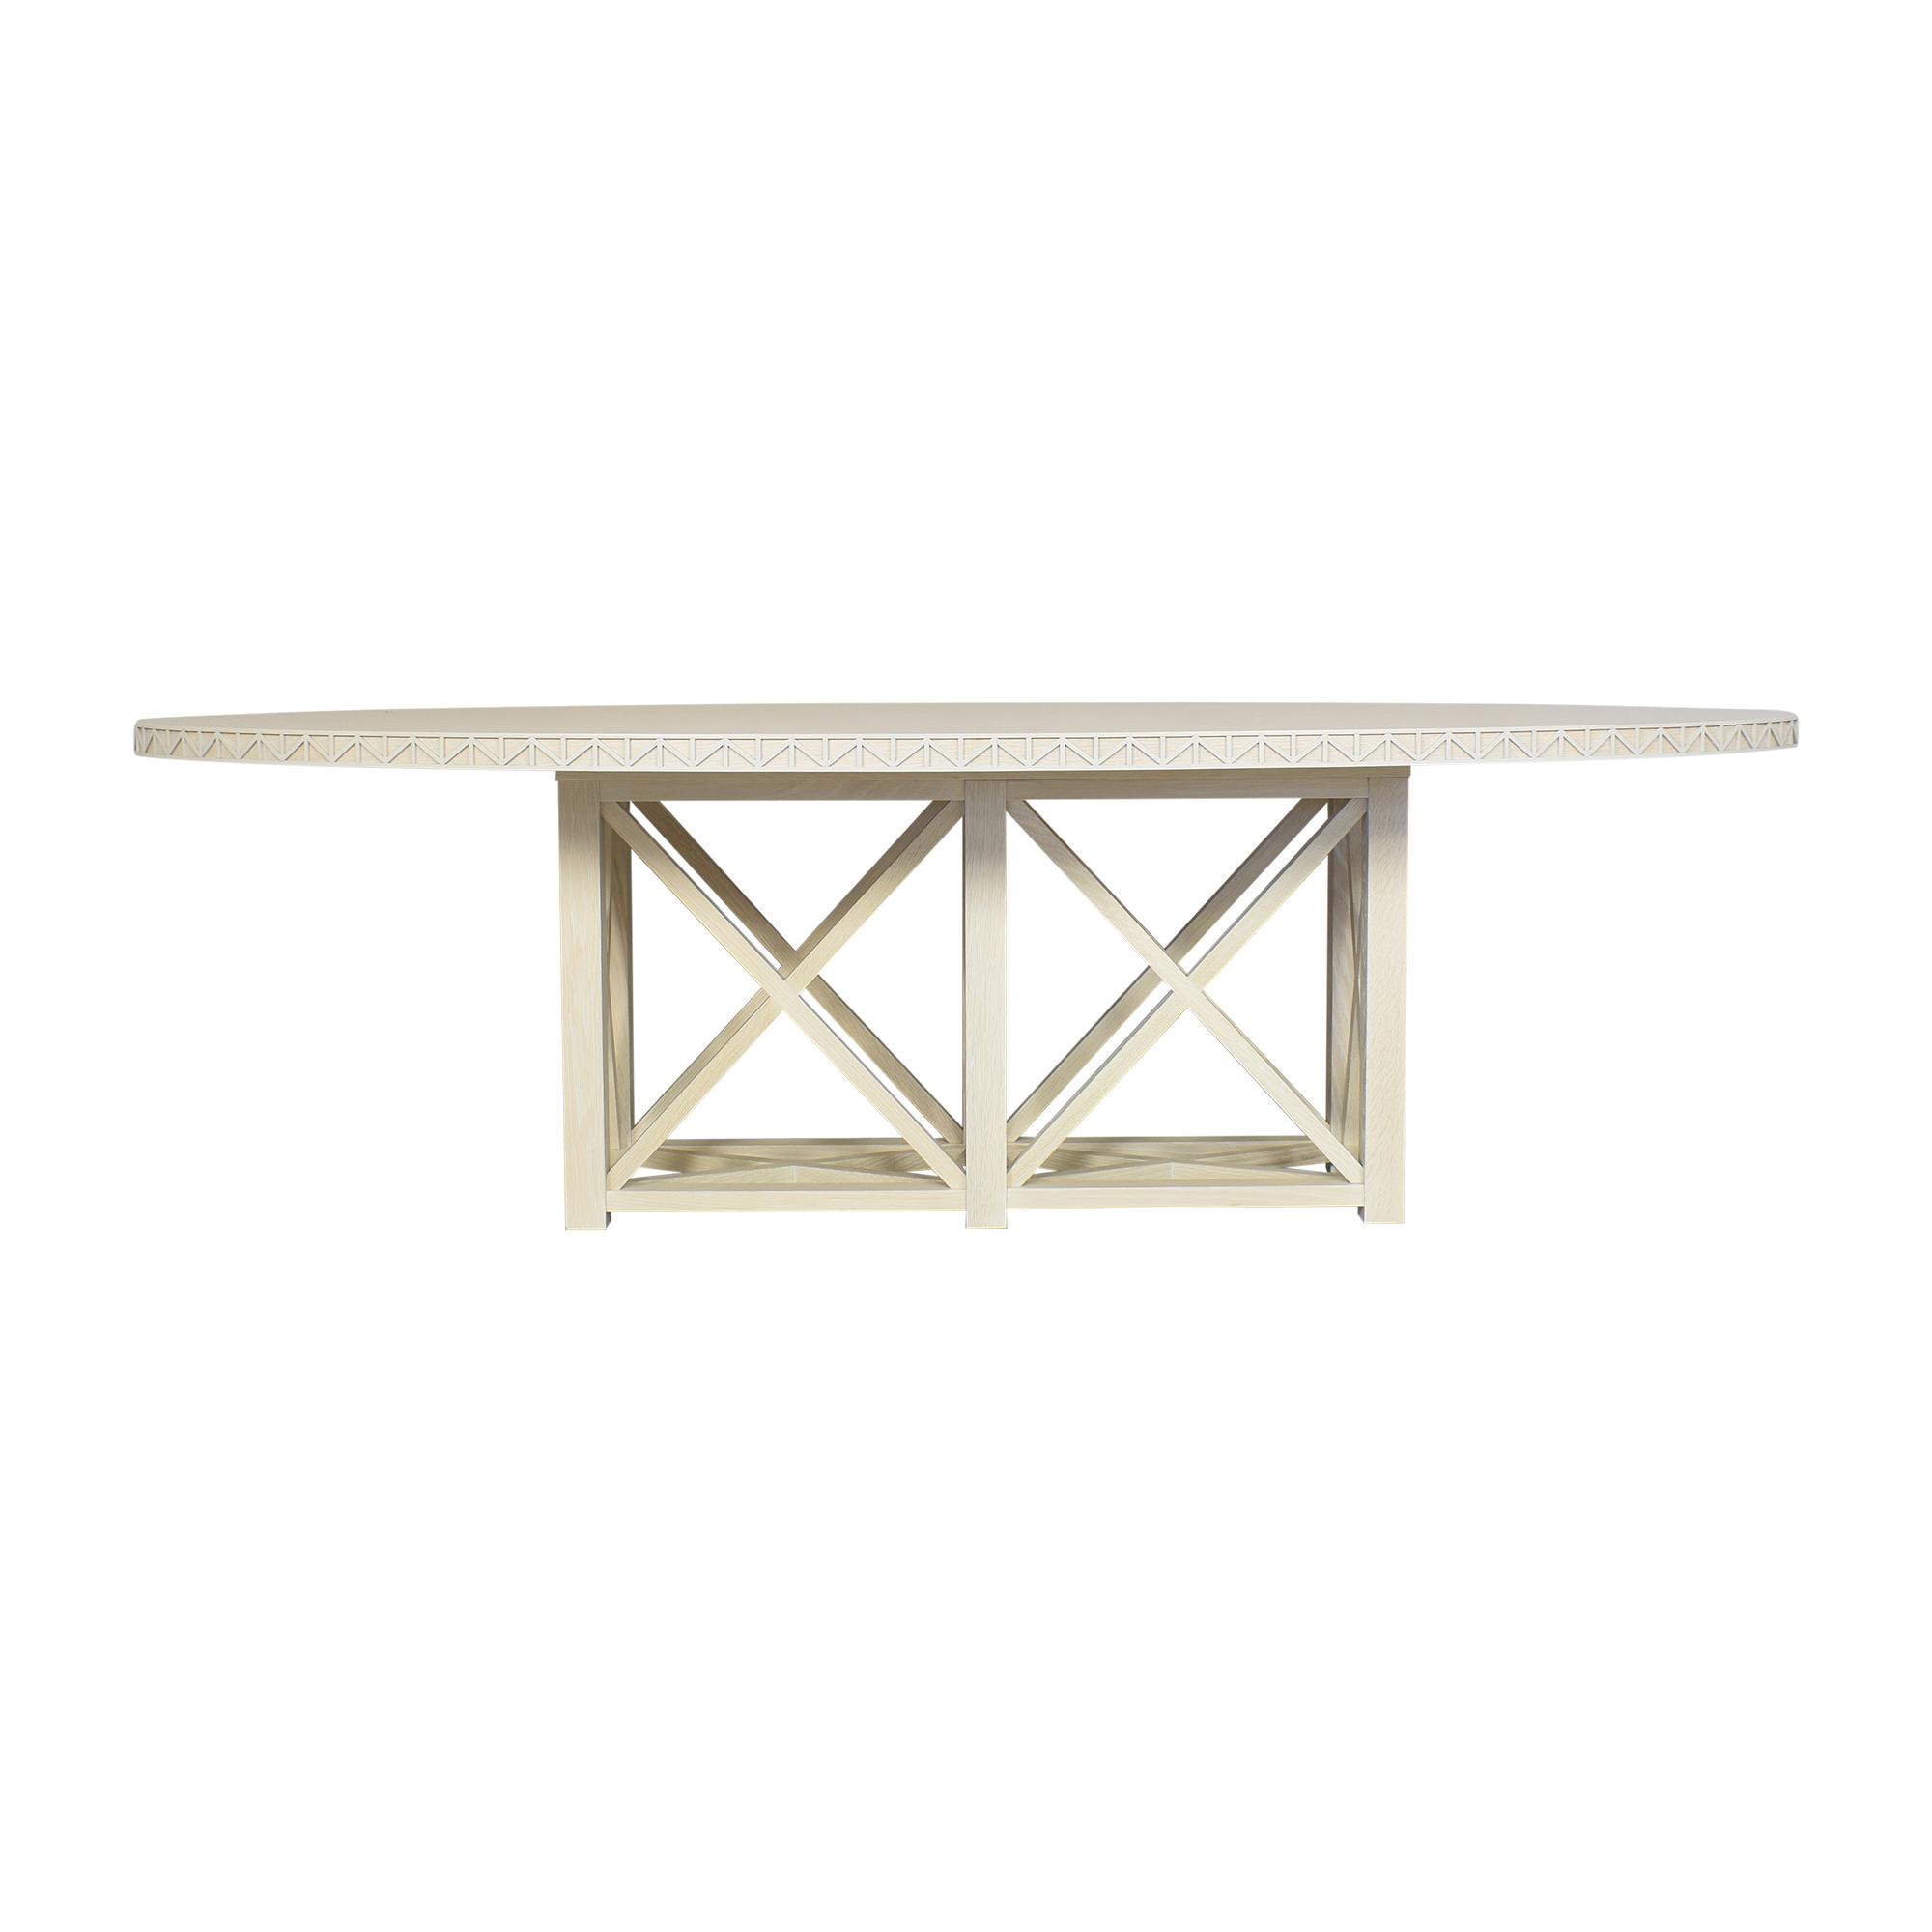 S.R. Gambrel S.R. Gambrel Custom Oval Dining Table Tables